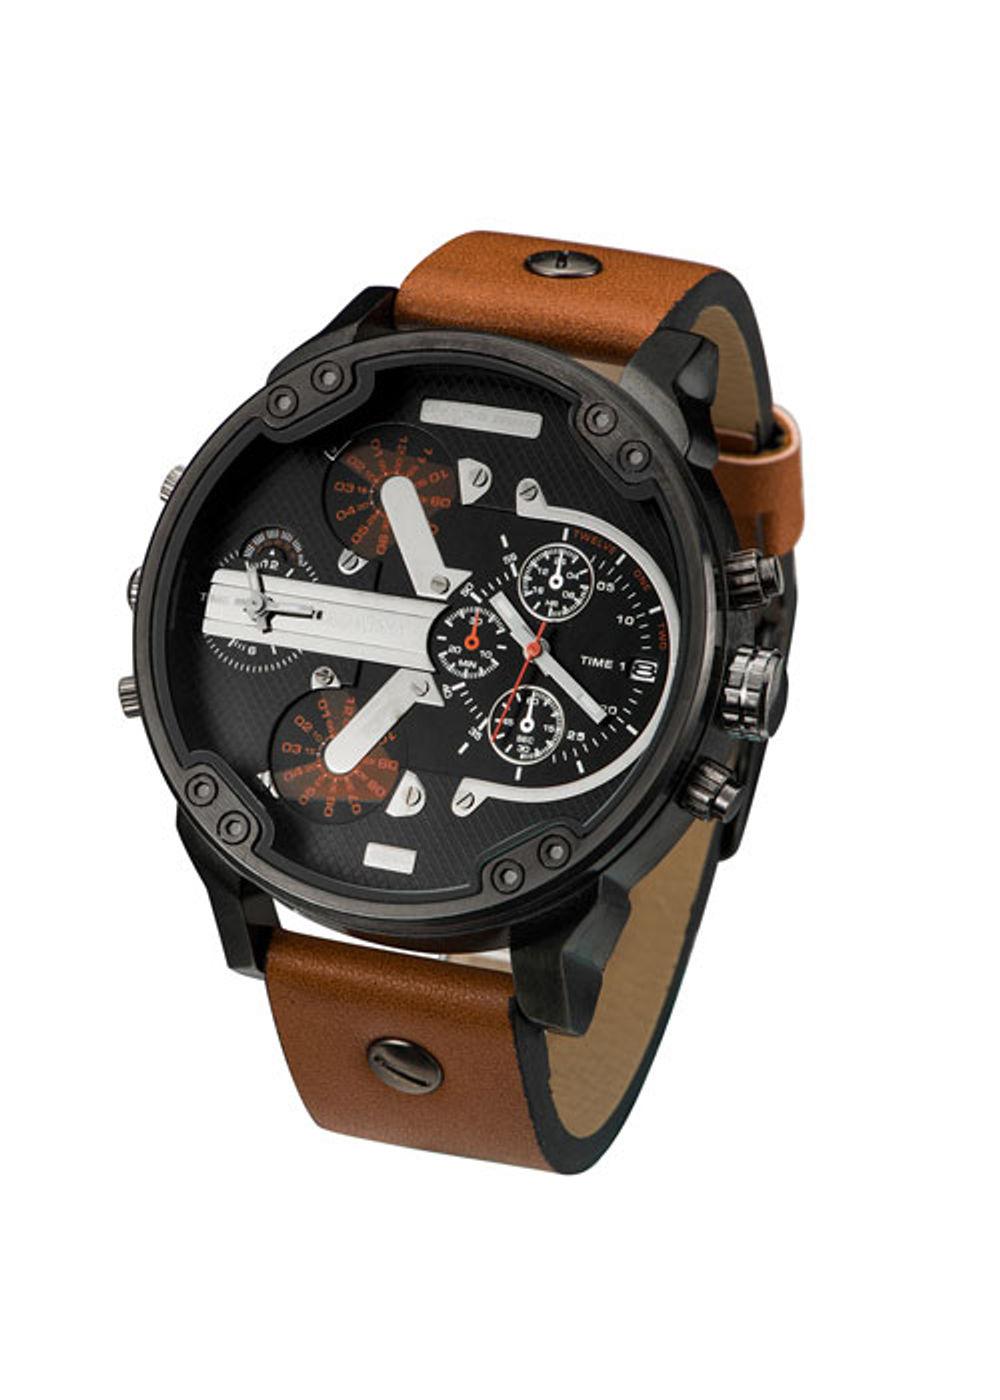 Cagarny big dial 6820 black tan analog dual time watch for men ca 6820 blk tan for Black tan watch